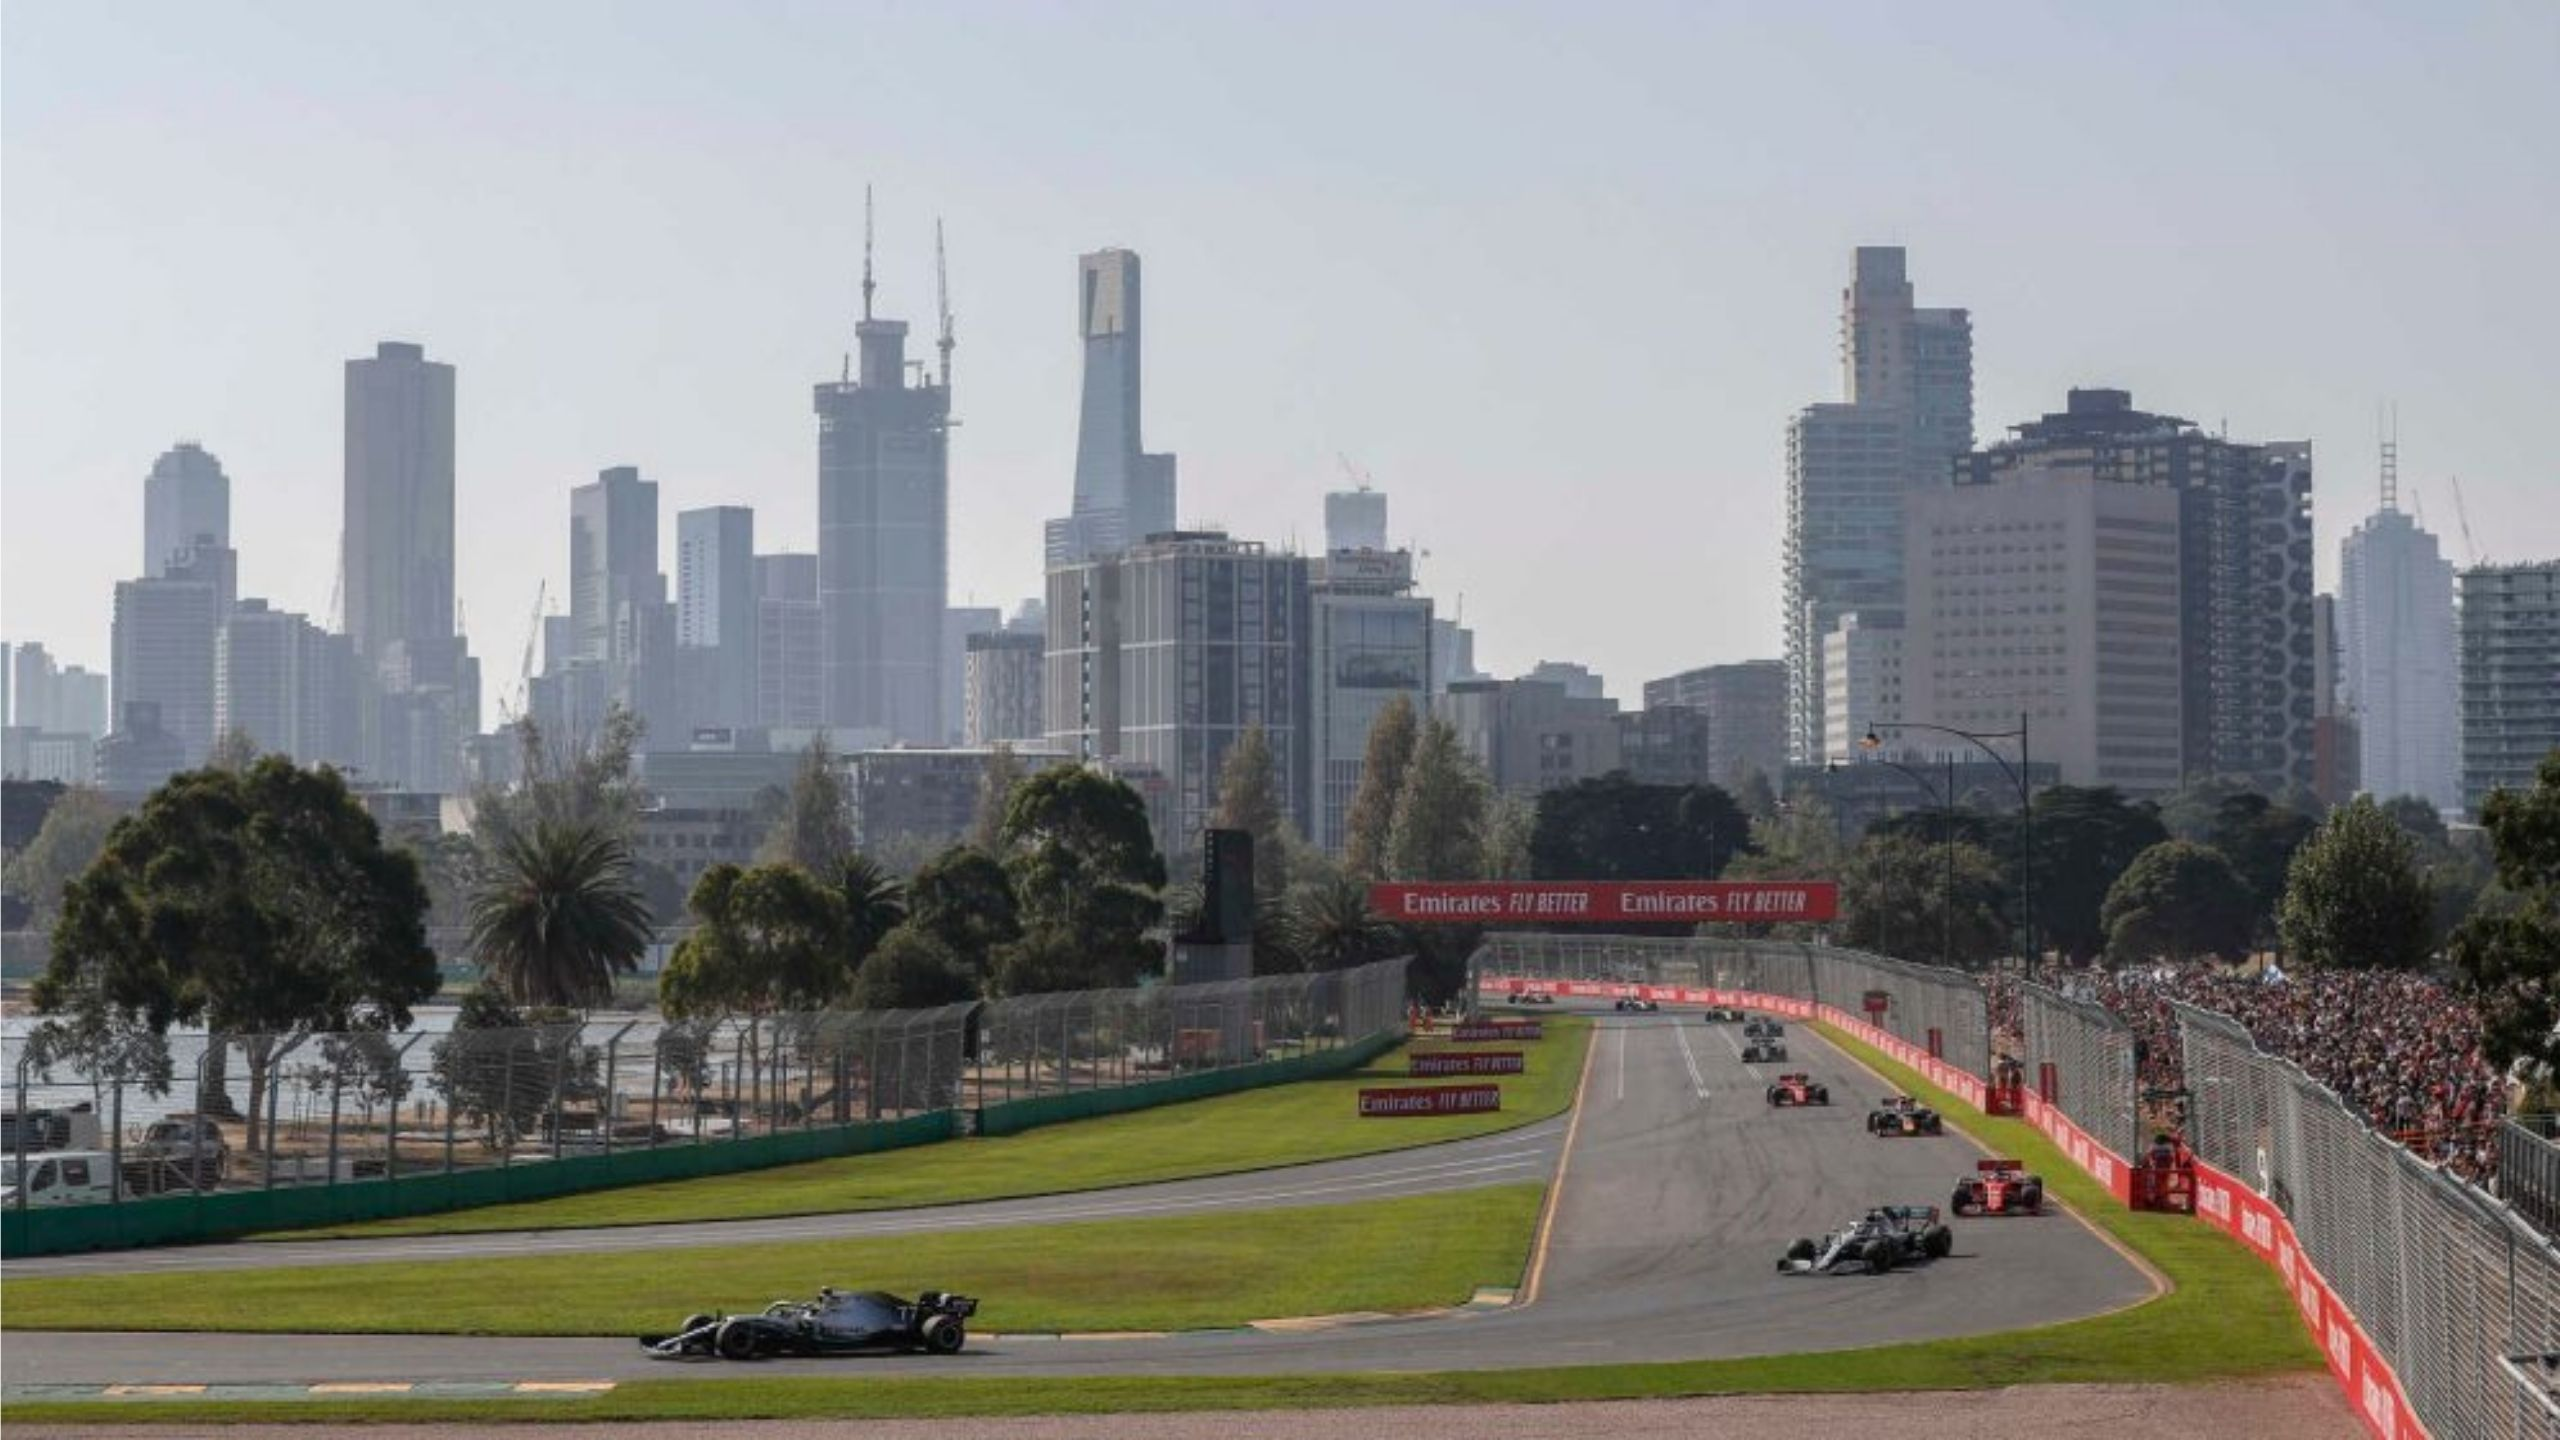 F1 2021 Calendar: Portimao and Imola could make shock returns to the calendar, replacing Australia and China